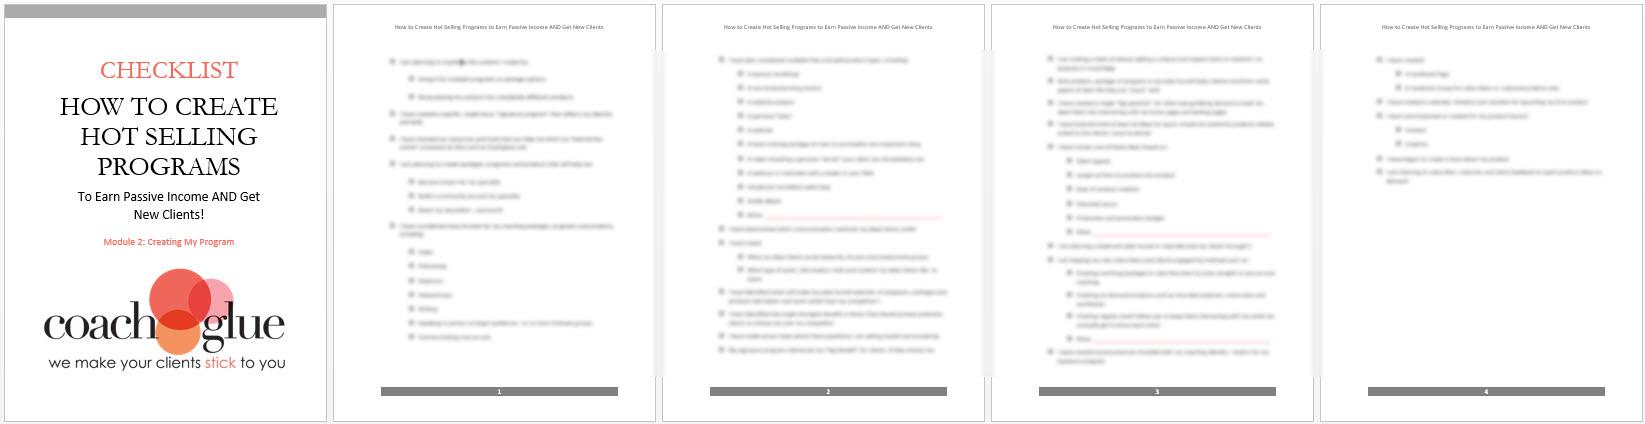 module 2 checklist